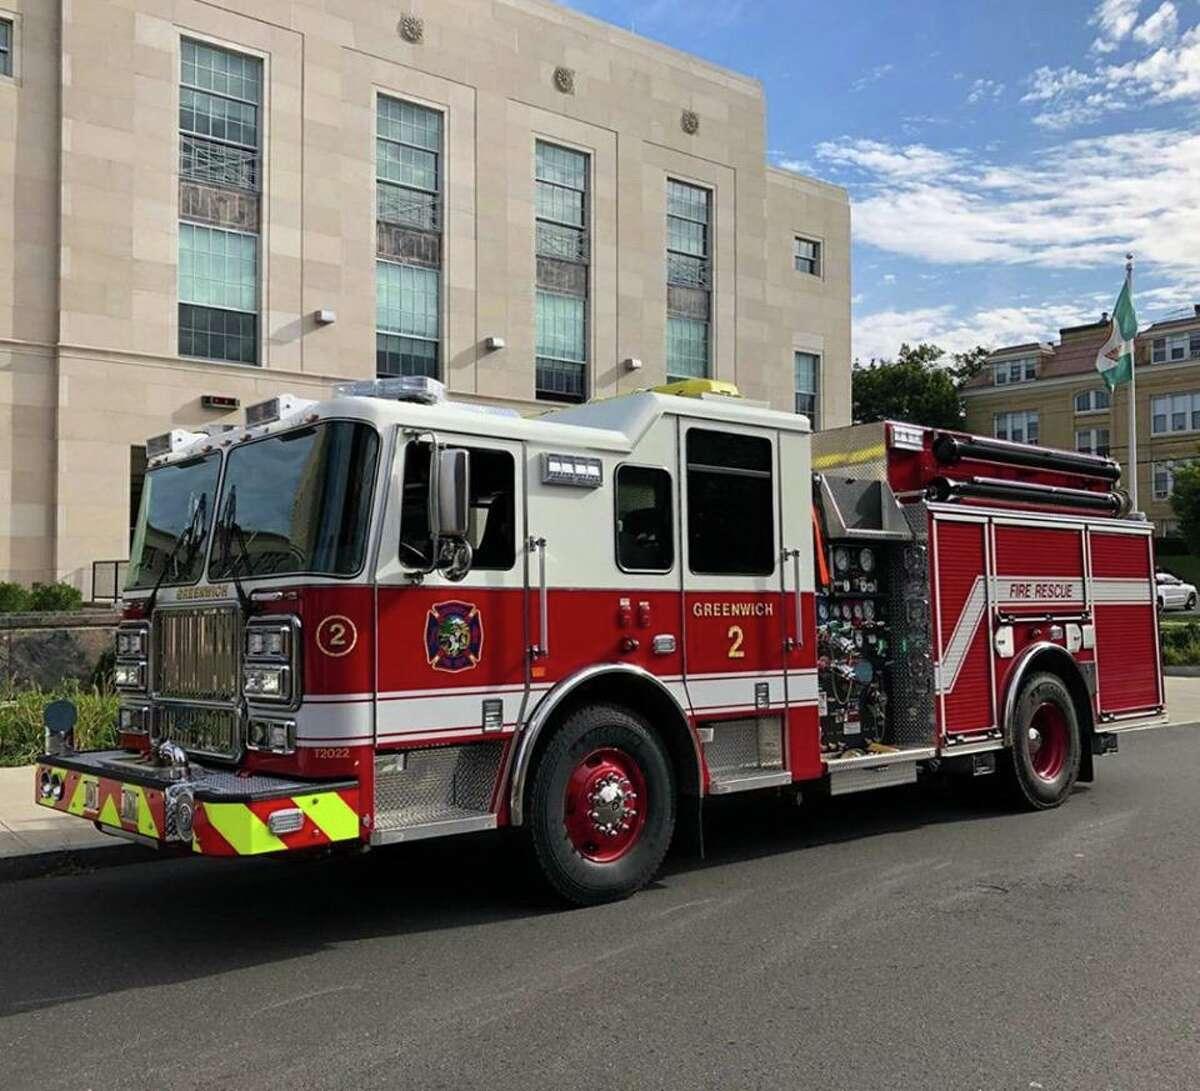 Greenwich fire engine